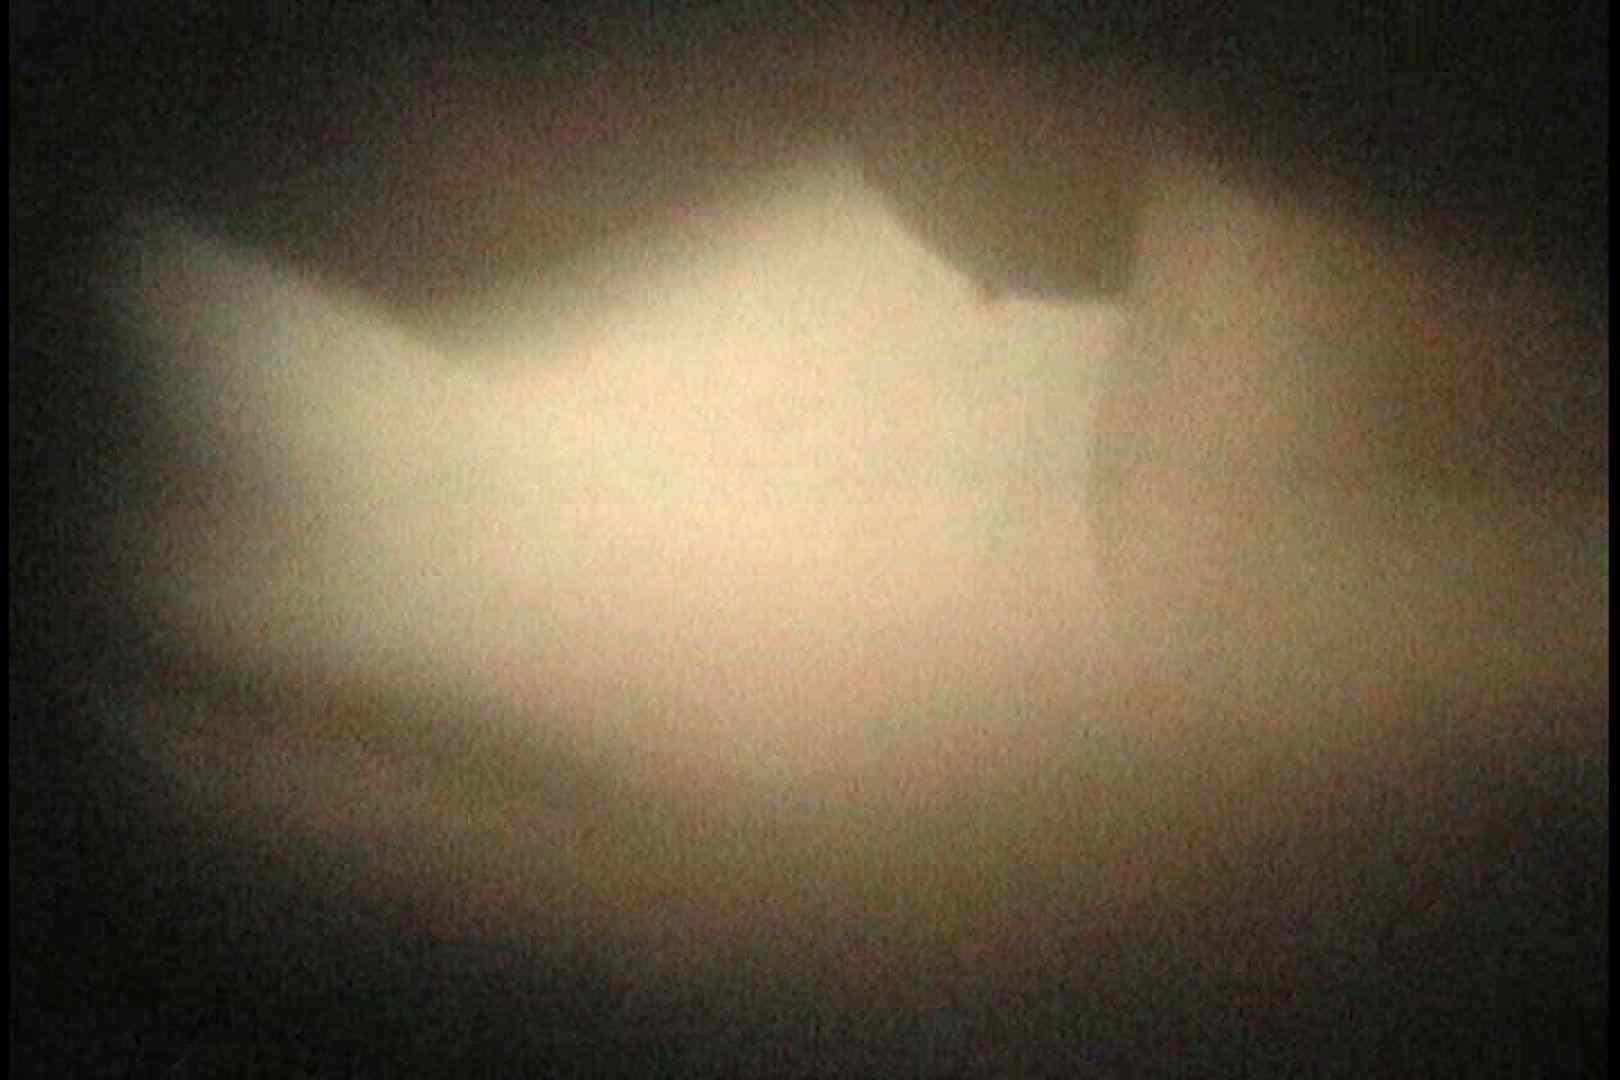 No.68 見事に可愛い巨乳ちゃん 室内暗いです ギャル達 オマンコ無修正動画無料 79枚 2